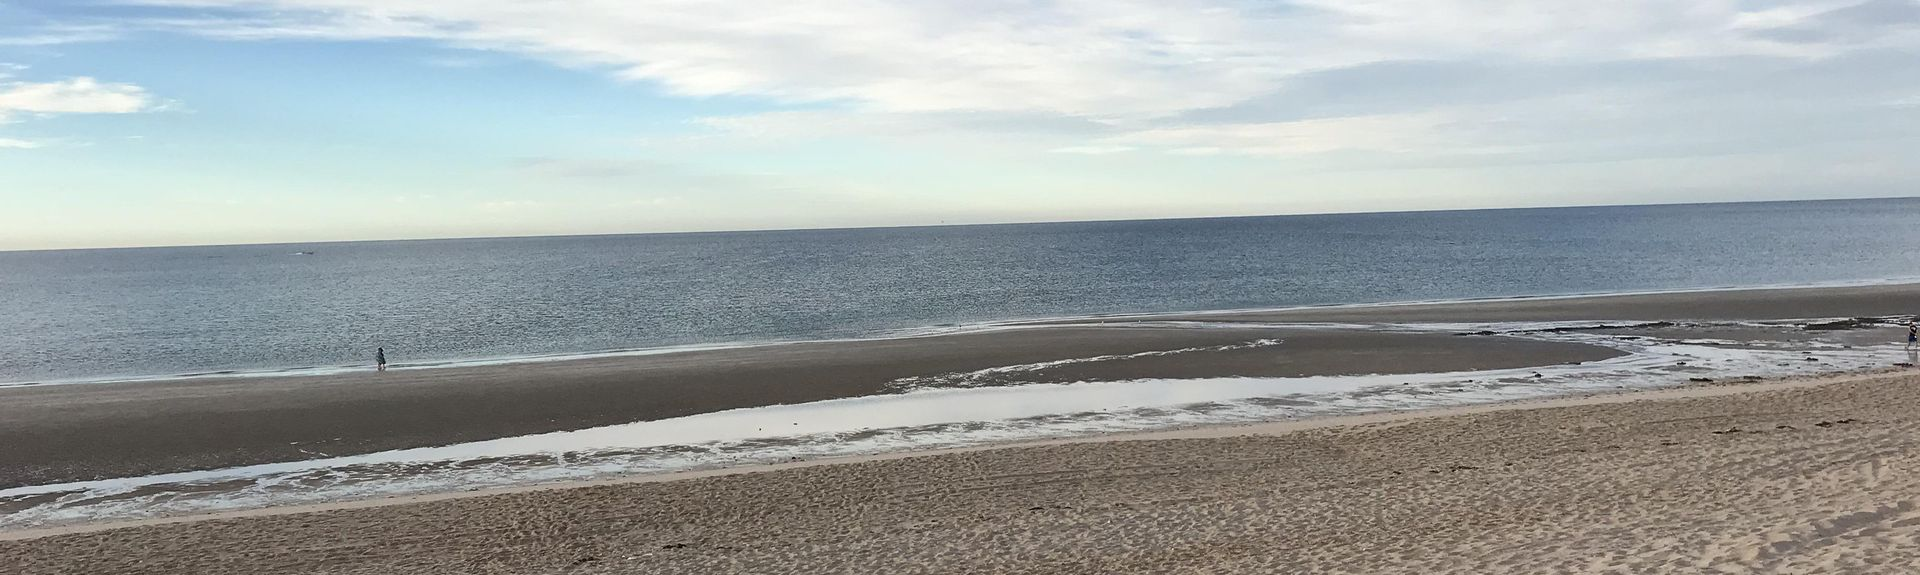 Sonoran Sea, Sandy Beach, Sonora, Mexico